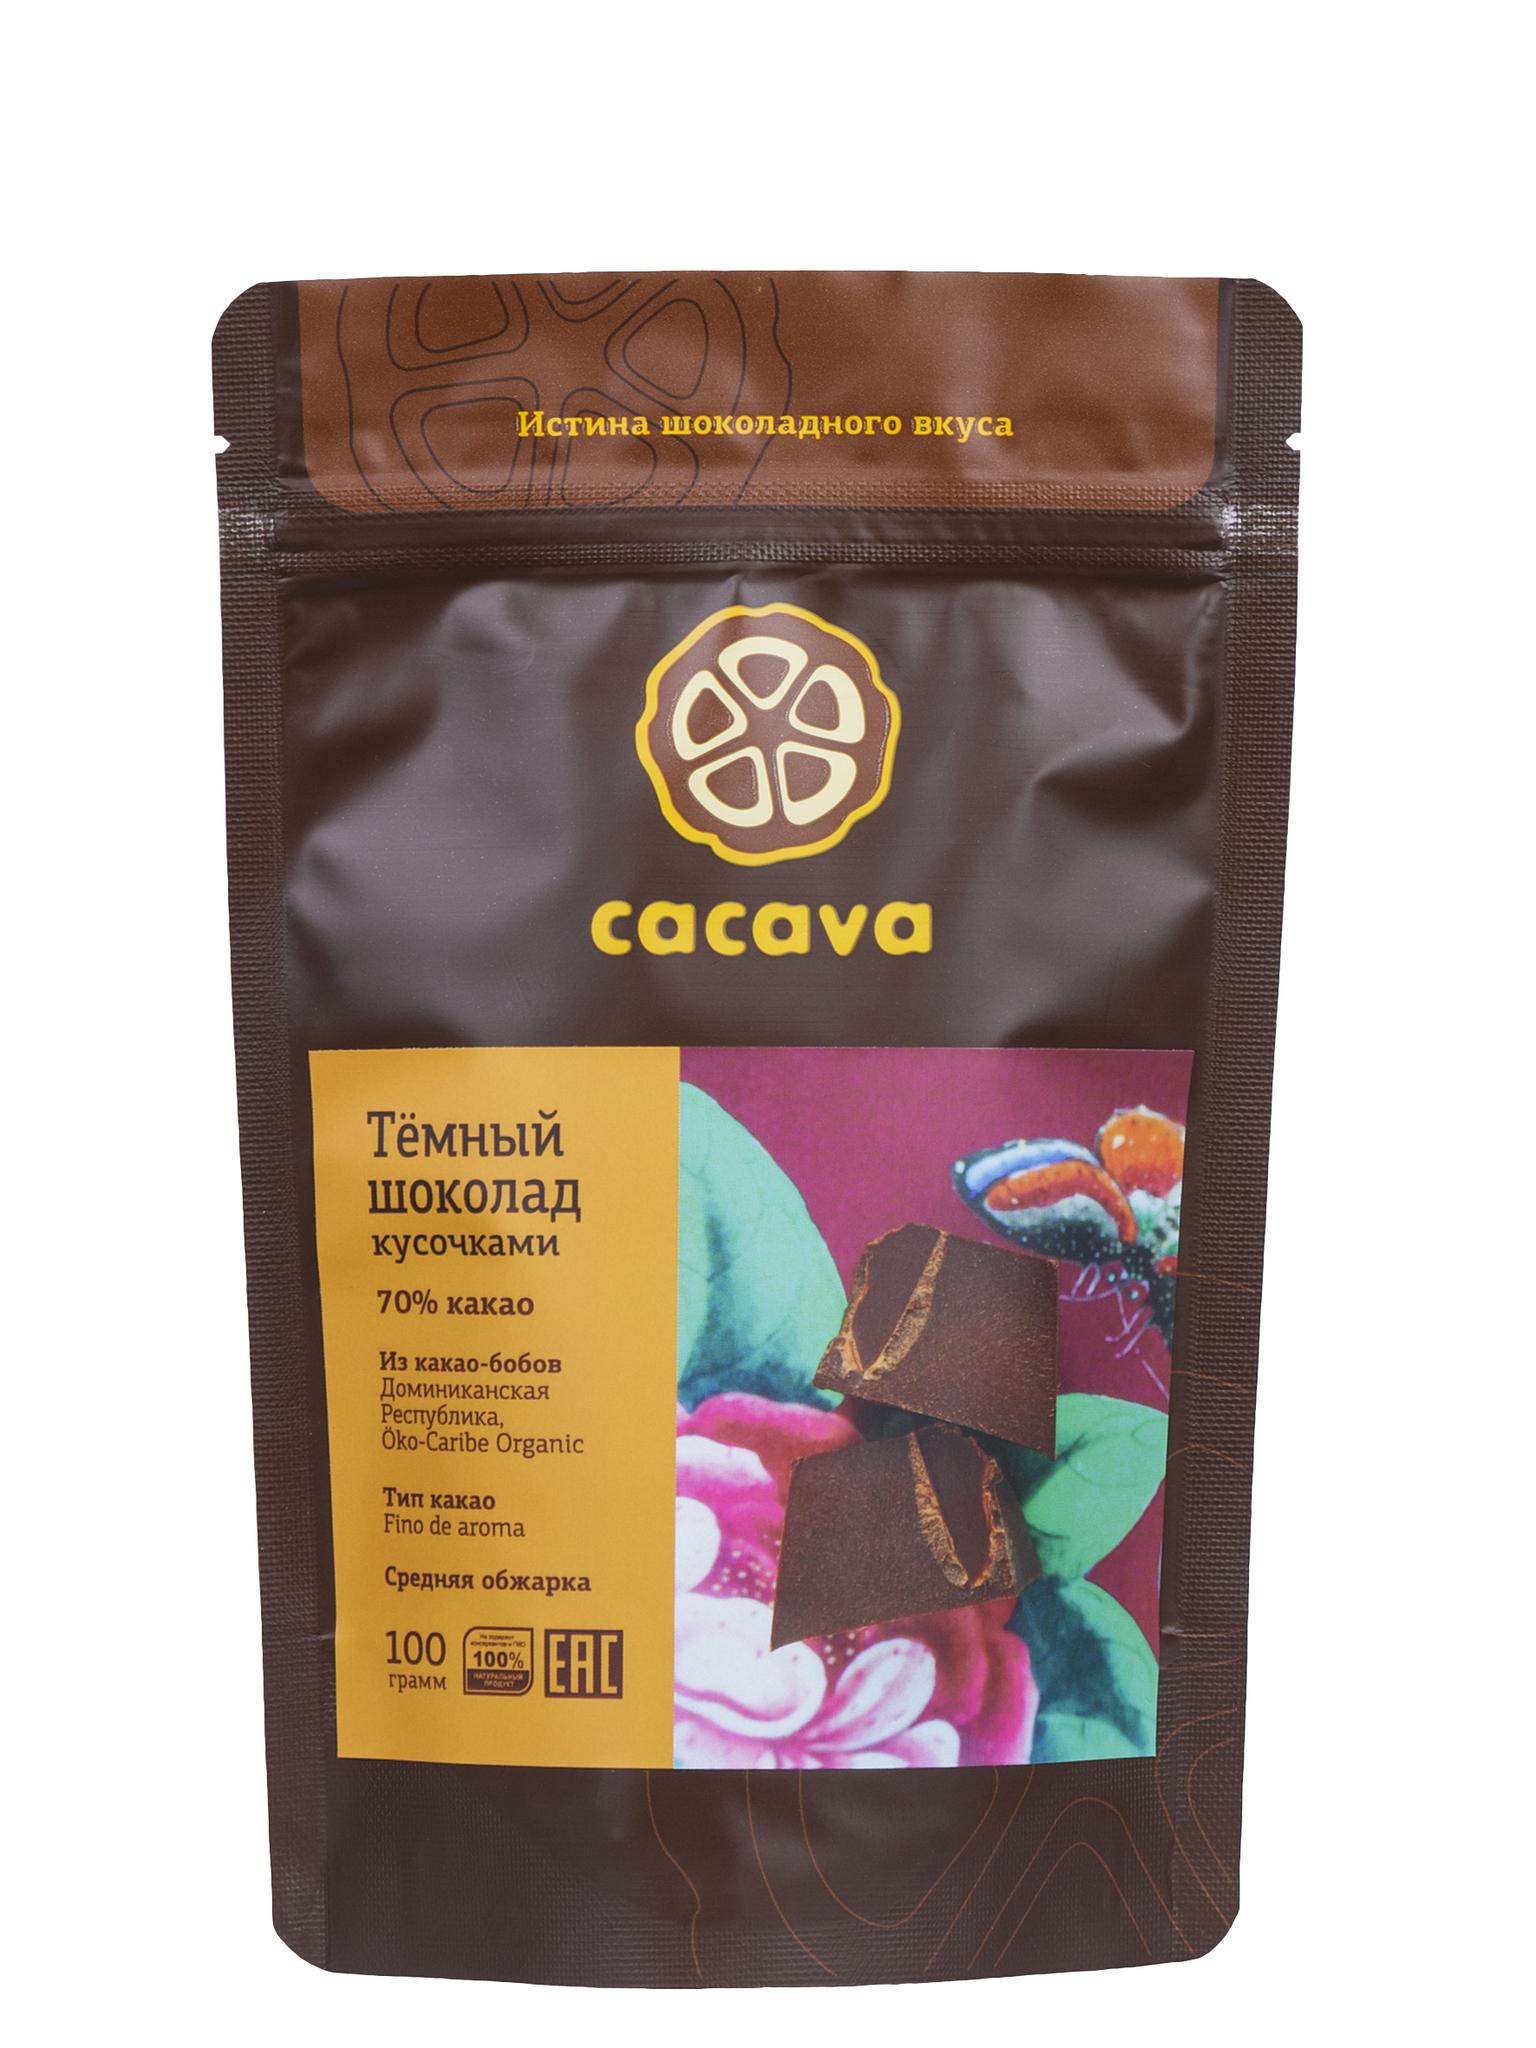 Тёмный шоколад 70 % какао (Доминикана, ÖKO CARIBE), упаковка 100 грамм